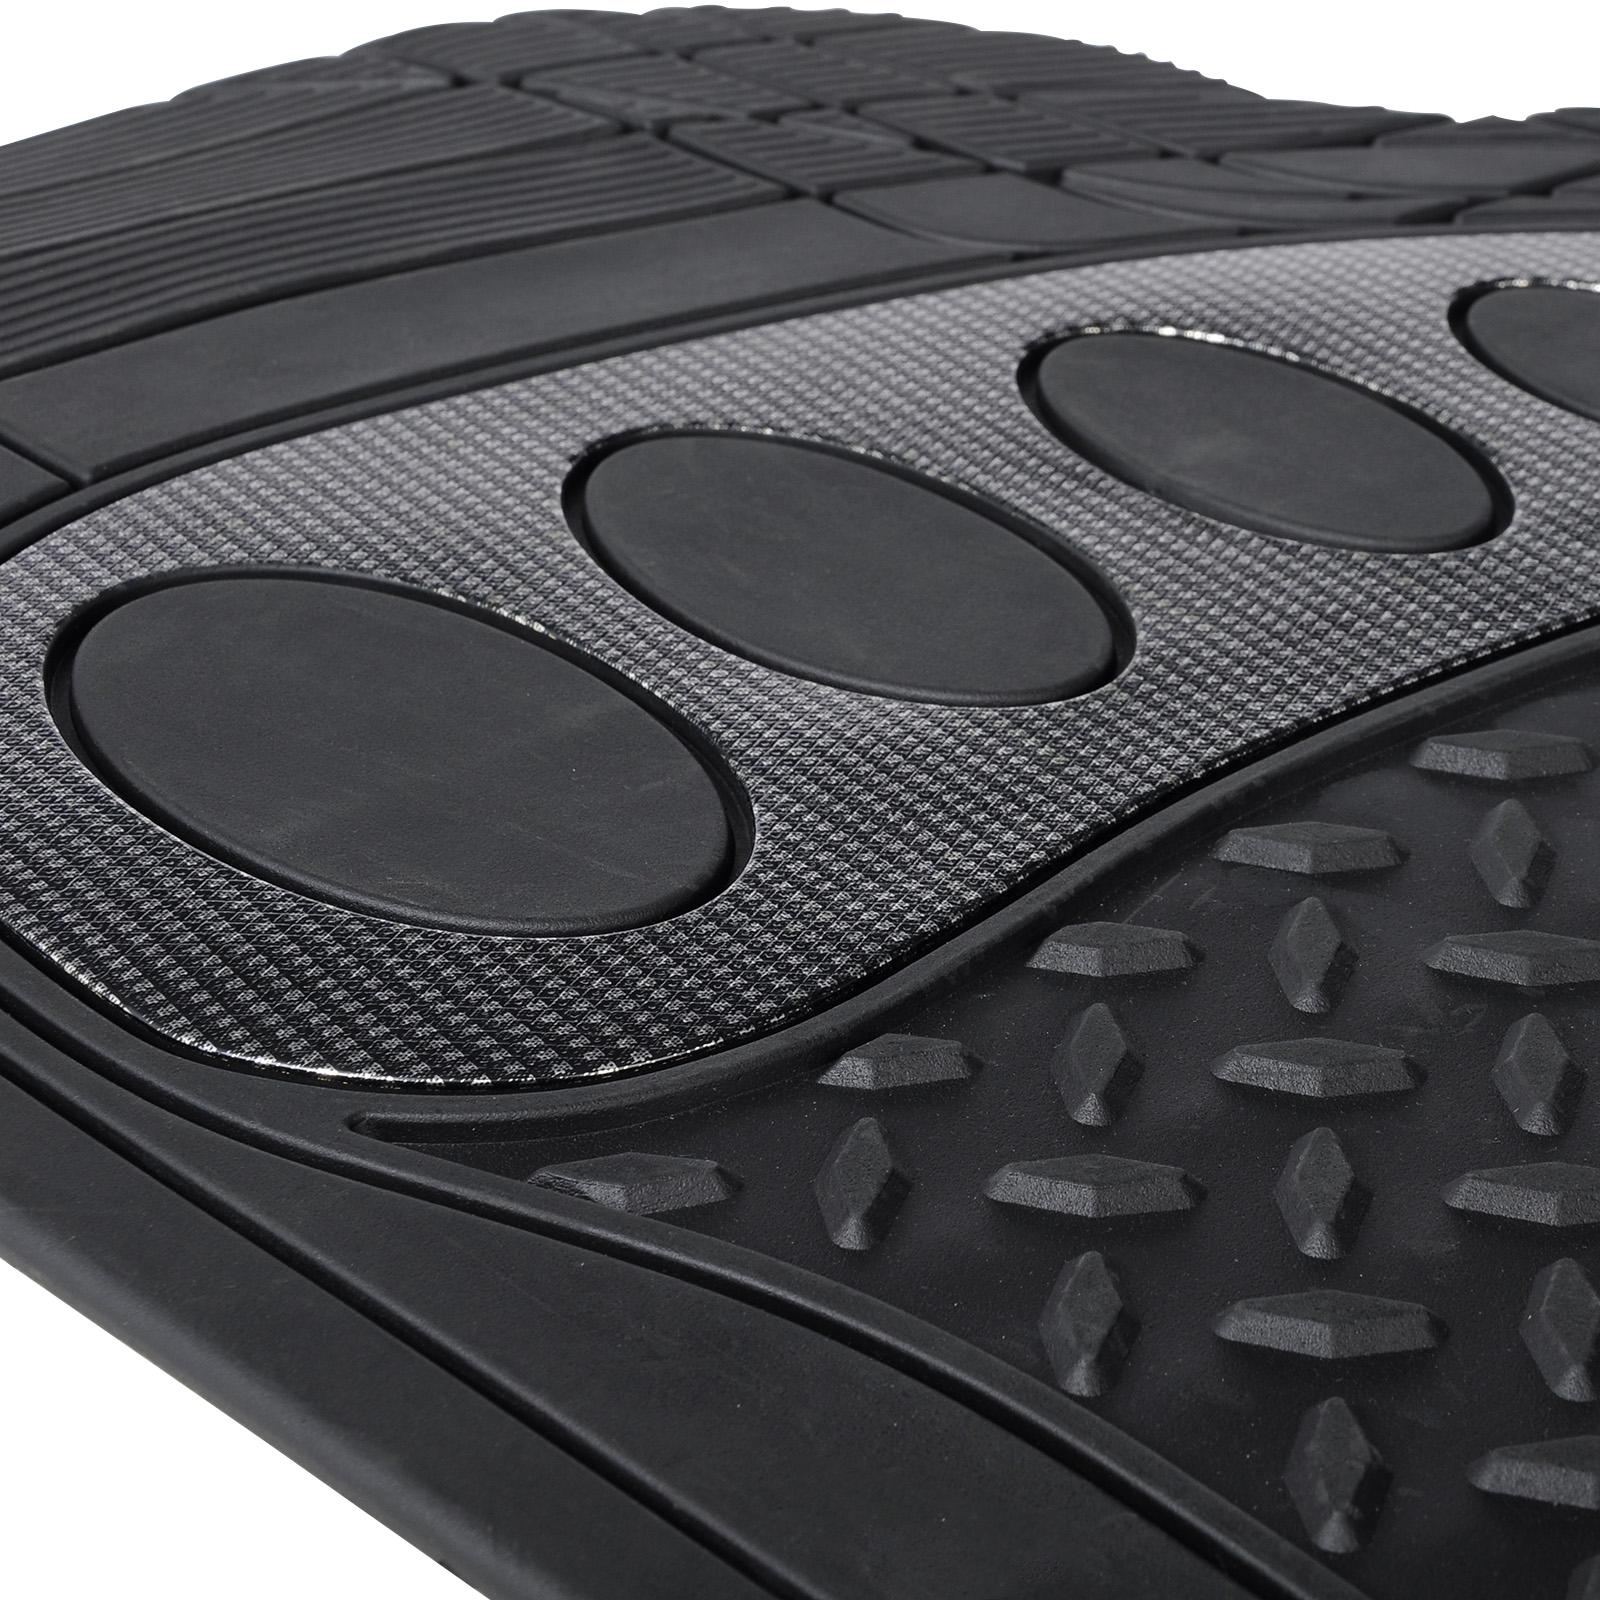 universal auto fu matten gummi matte riffelblech 4 teilig schwarz am7176sz ebay. Black Bedroom Furniture Sets. Home Design Ideas